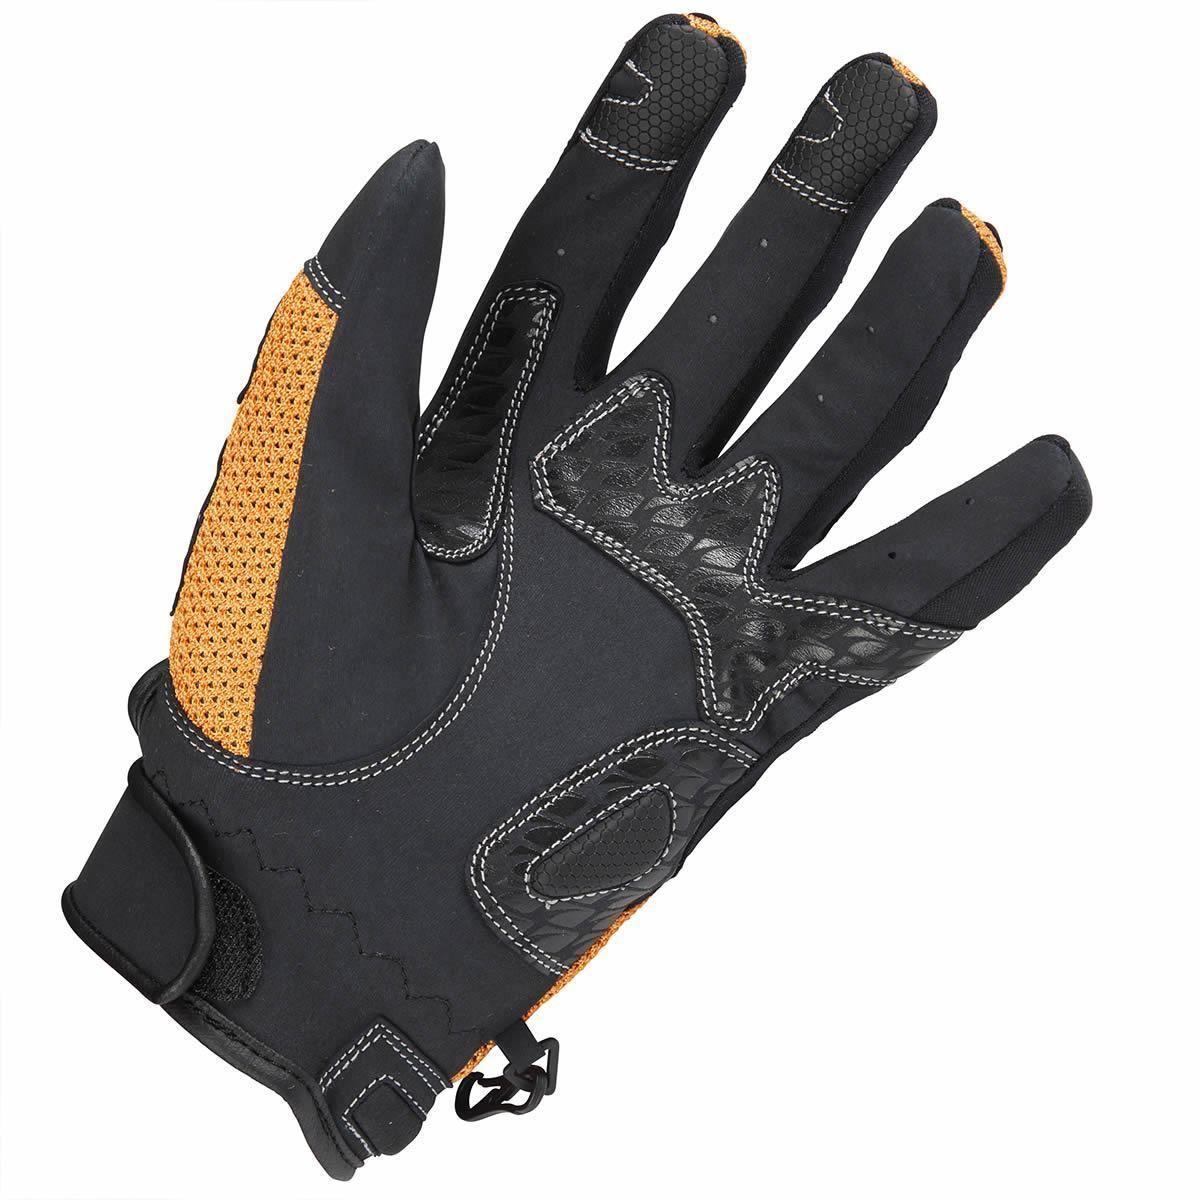 Spada-Mx-Air-Cuir-amp-Textile-Gants-Moto-Noir-Orange-Touring-Blinde miniature 11